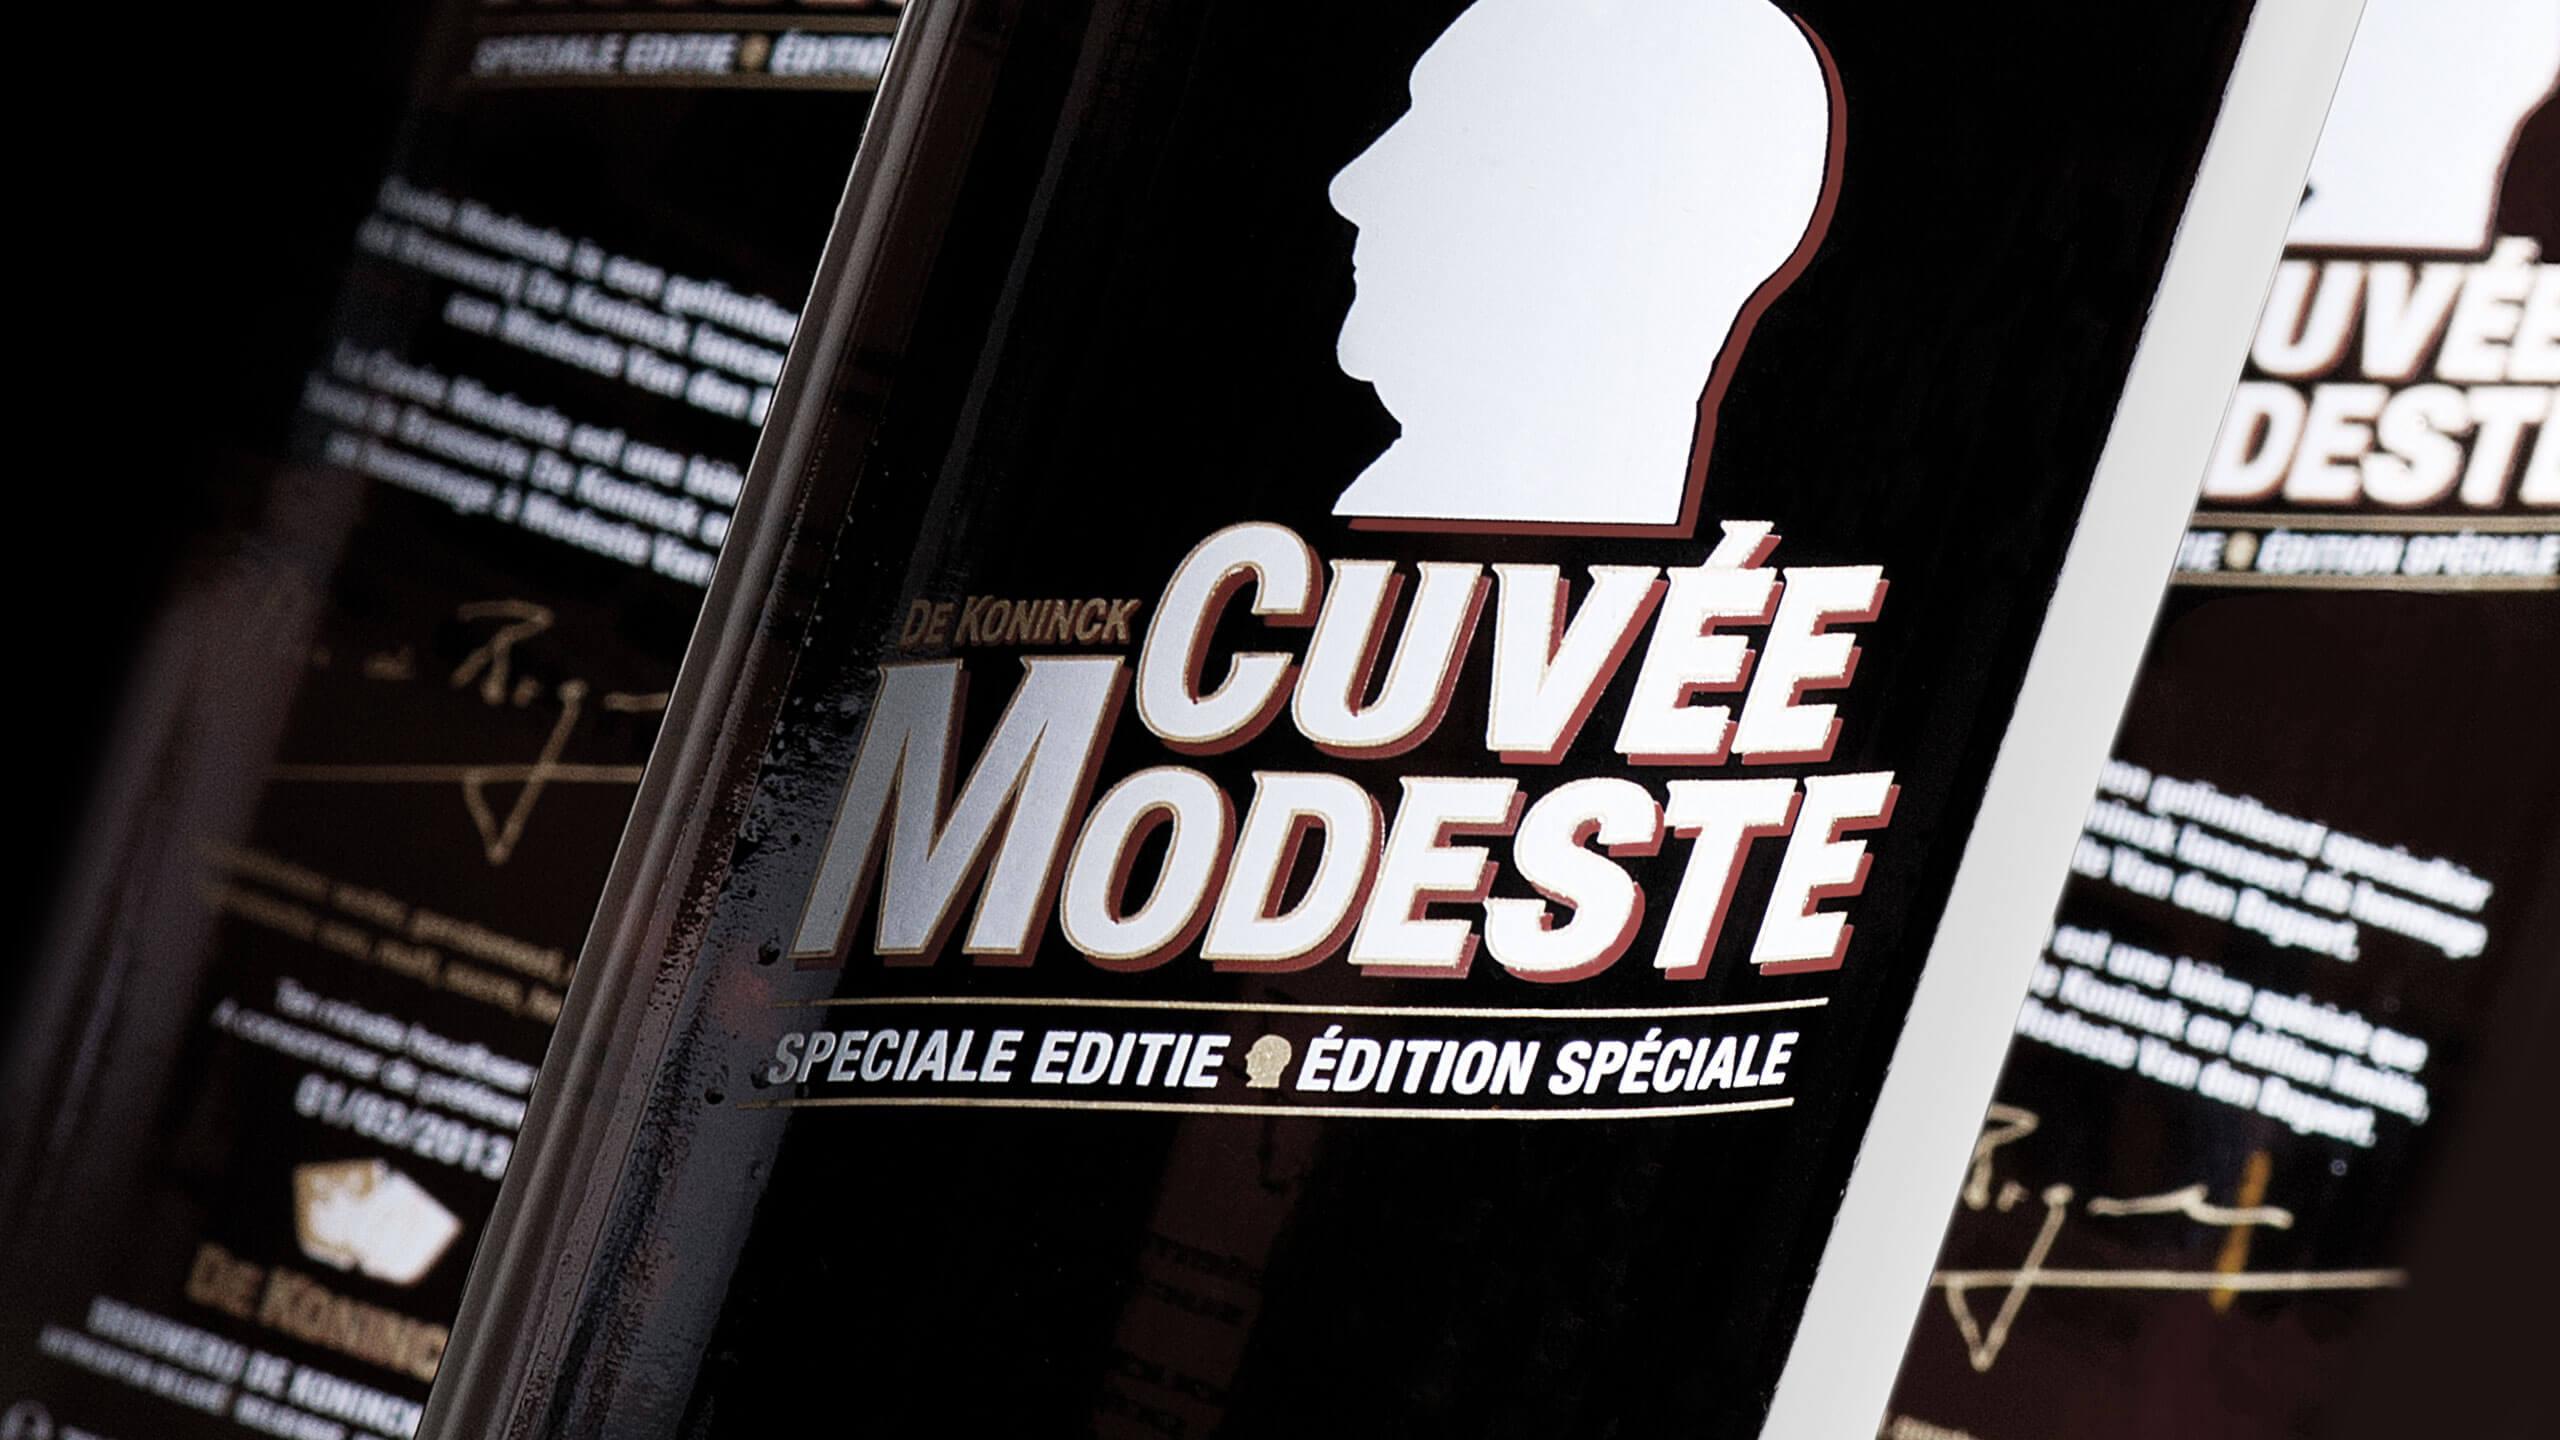 CuveeModeste_00